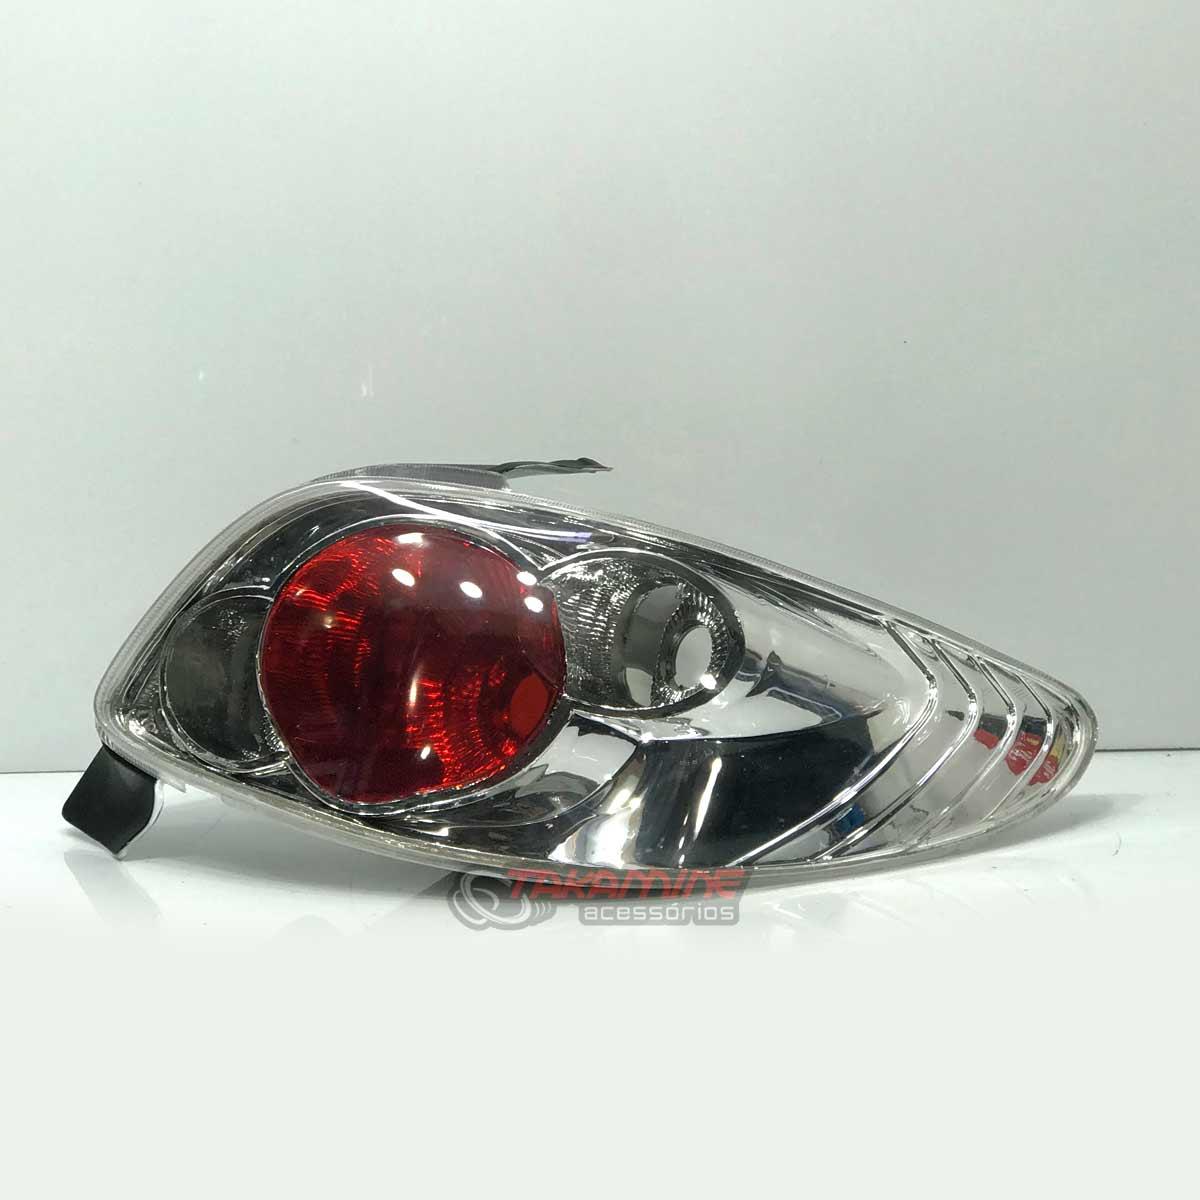 Lanterna traseira Peugeot 206 1996 até 2008 cristal (PAR)